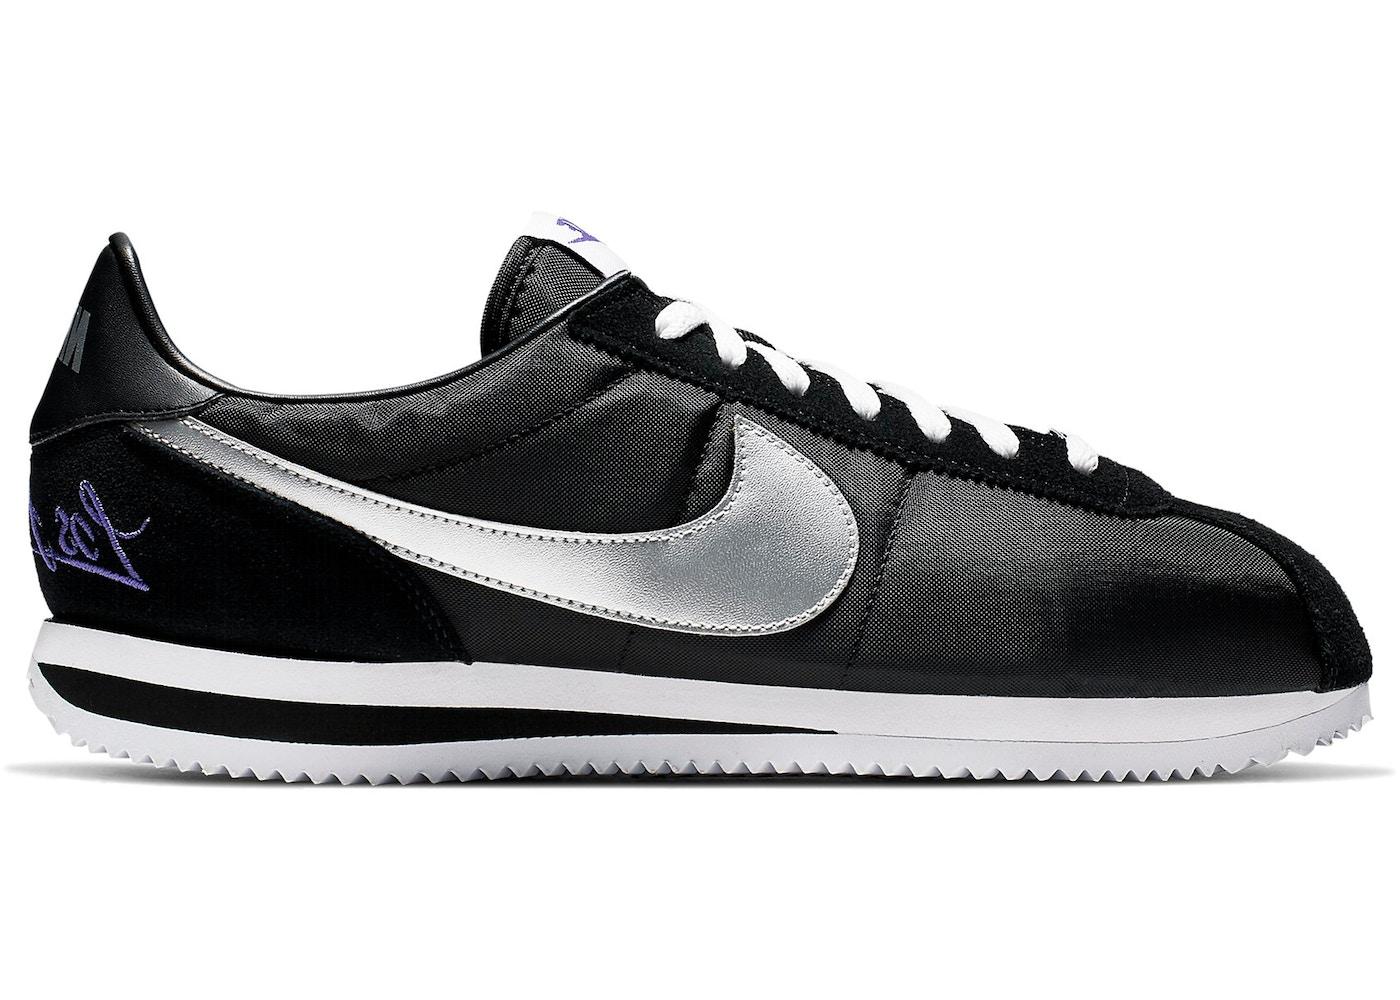 timeless design c6062 ddfdb Nike Cortez Los Angeles Black